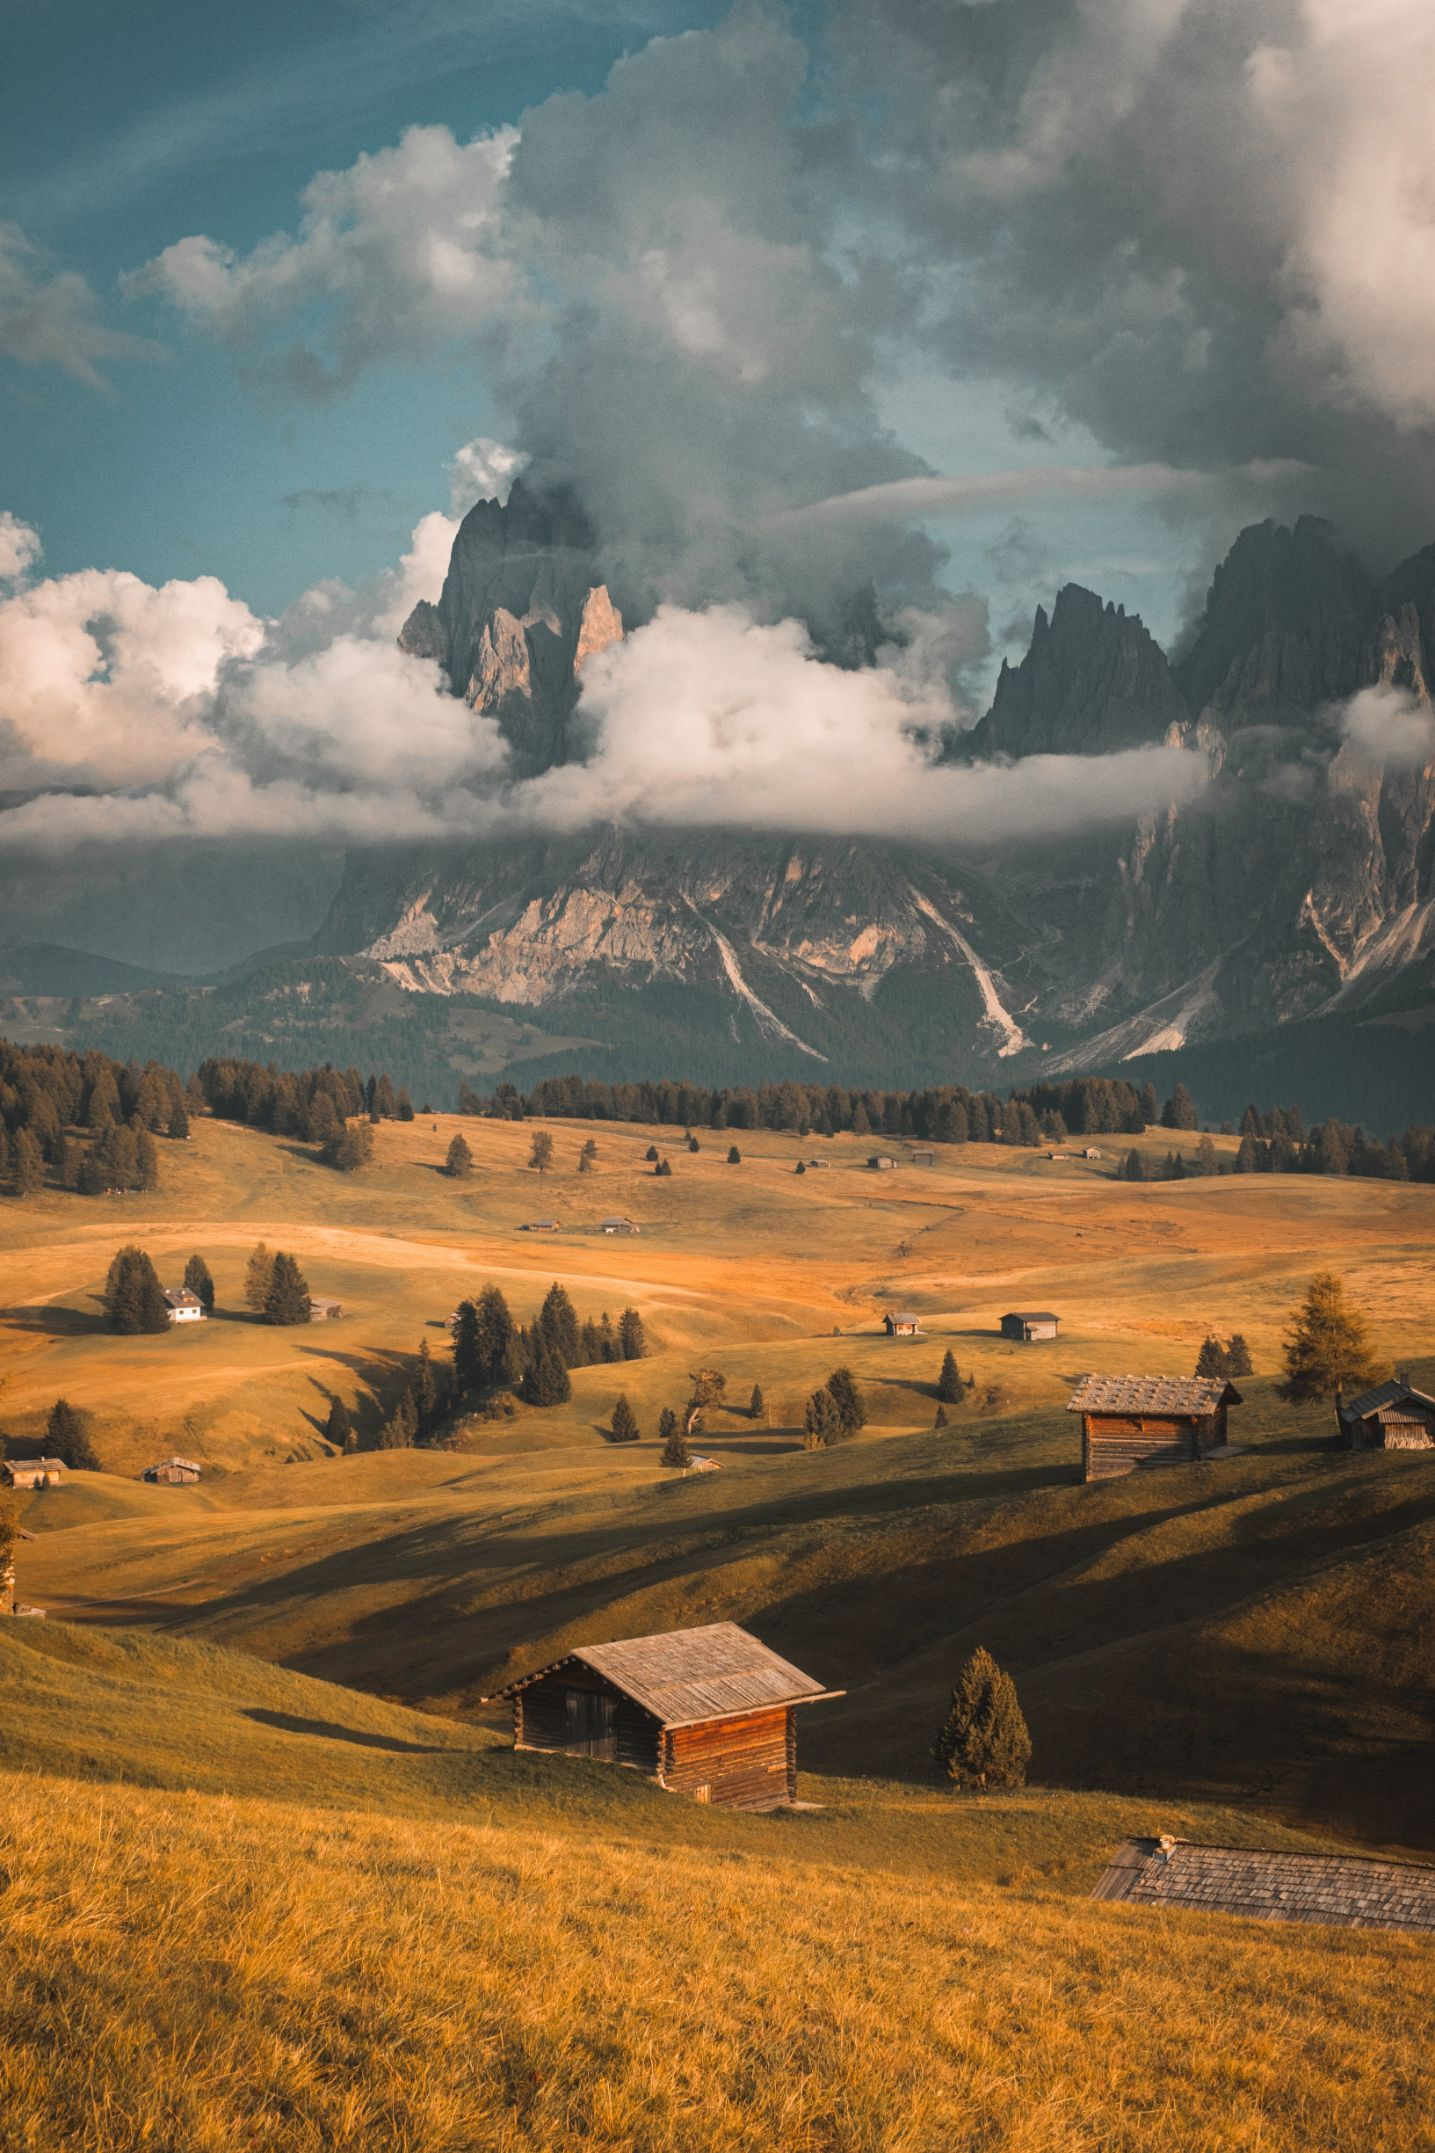 Landscape Photography 1